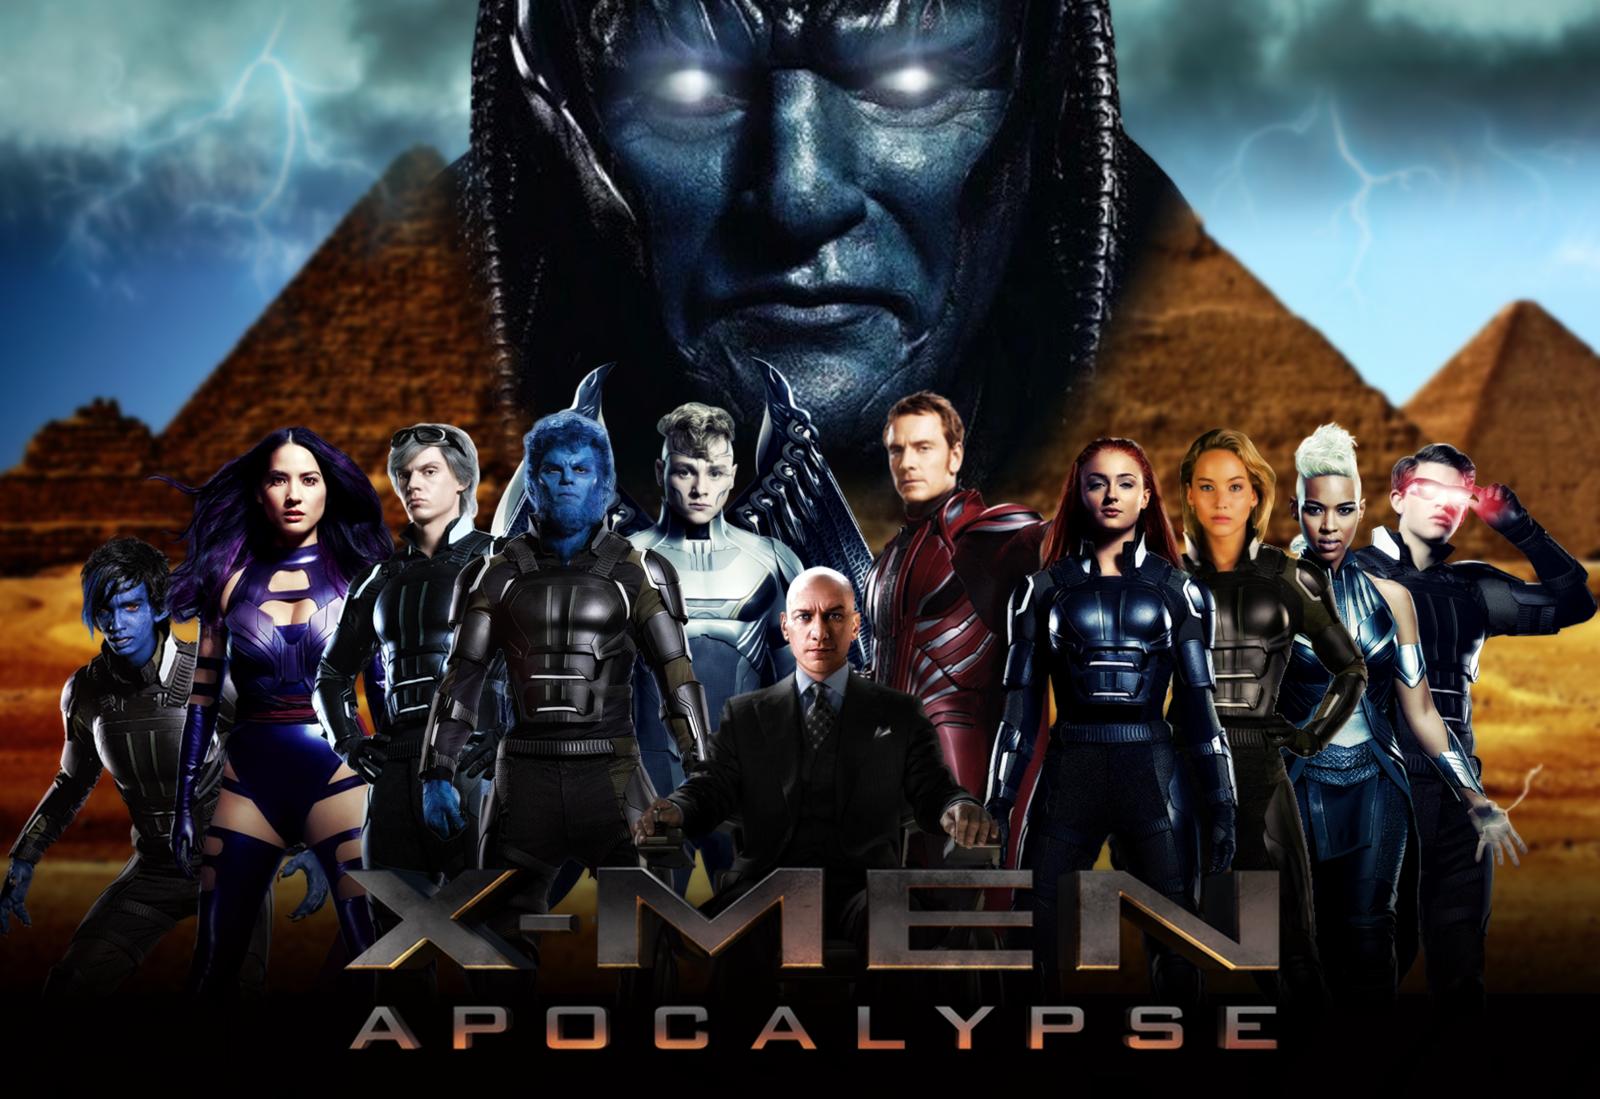 X men Apocalypse wallpaper by ArkhamNatic 1600x1099